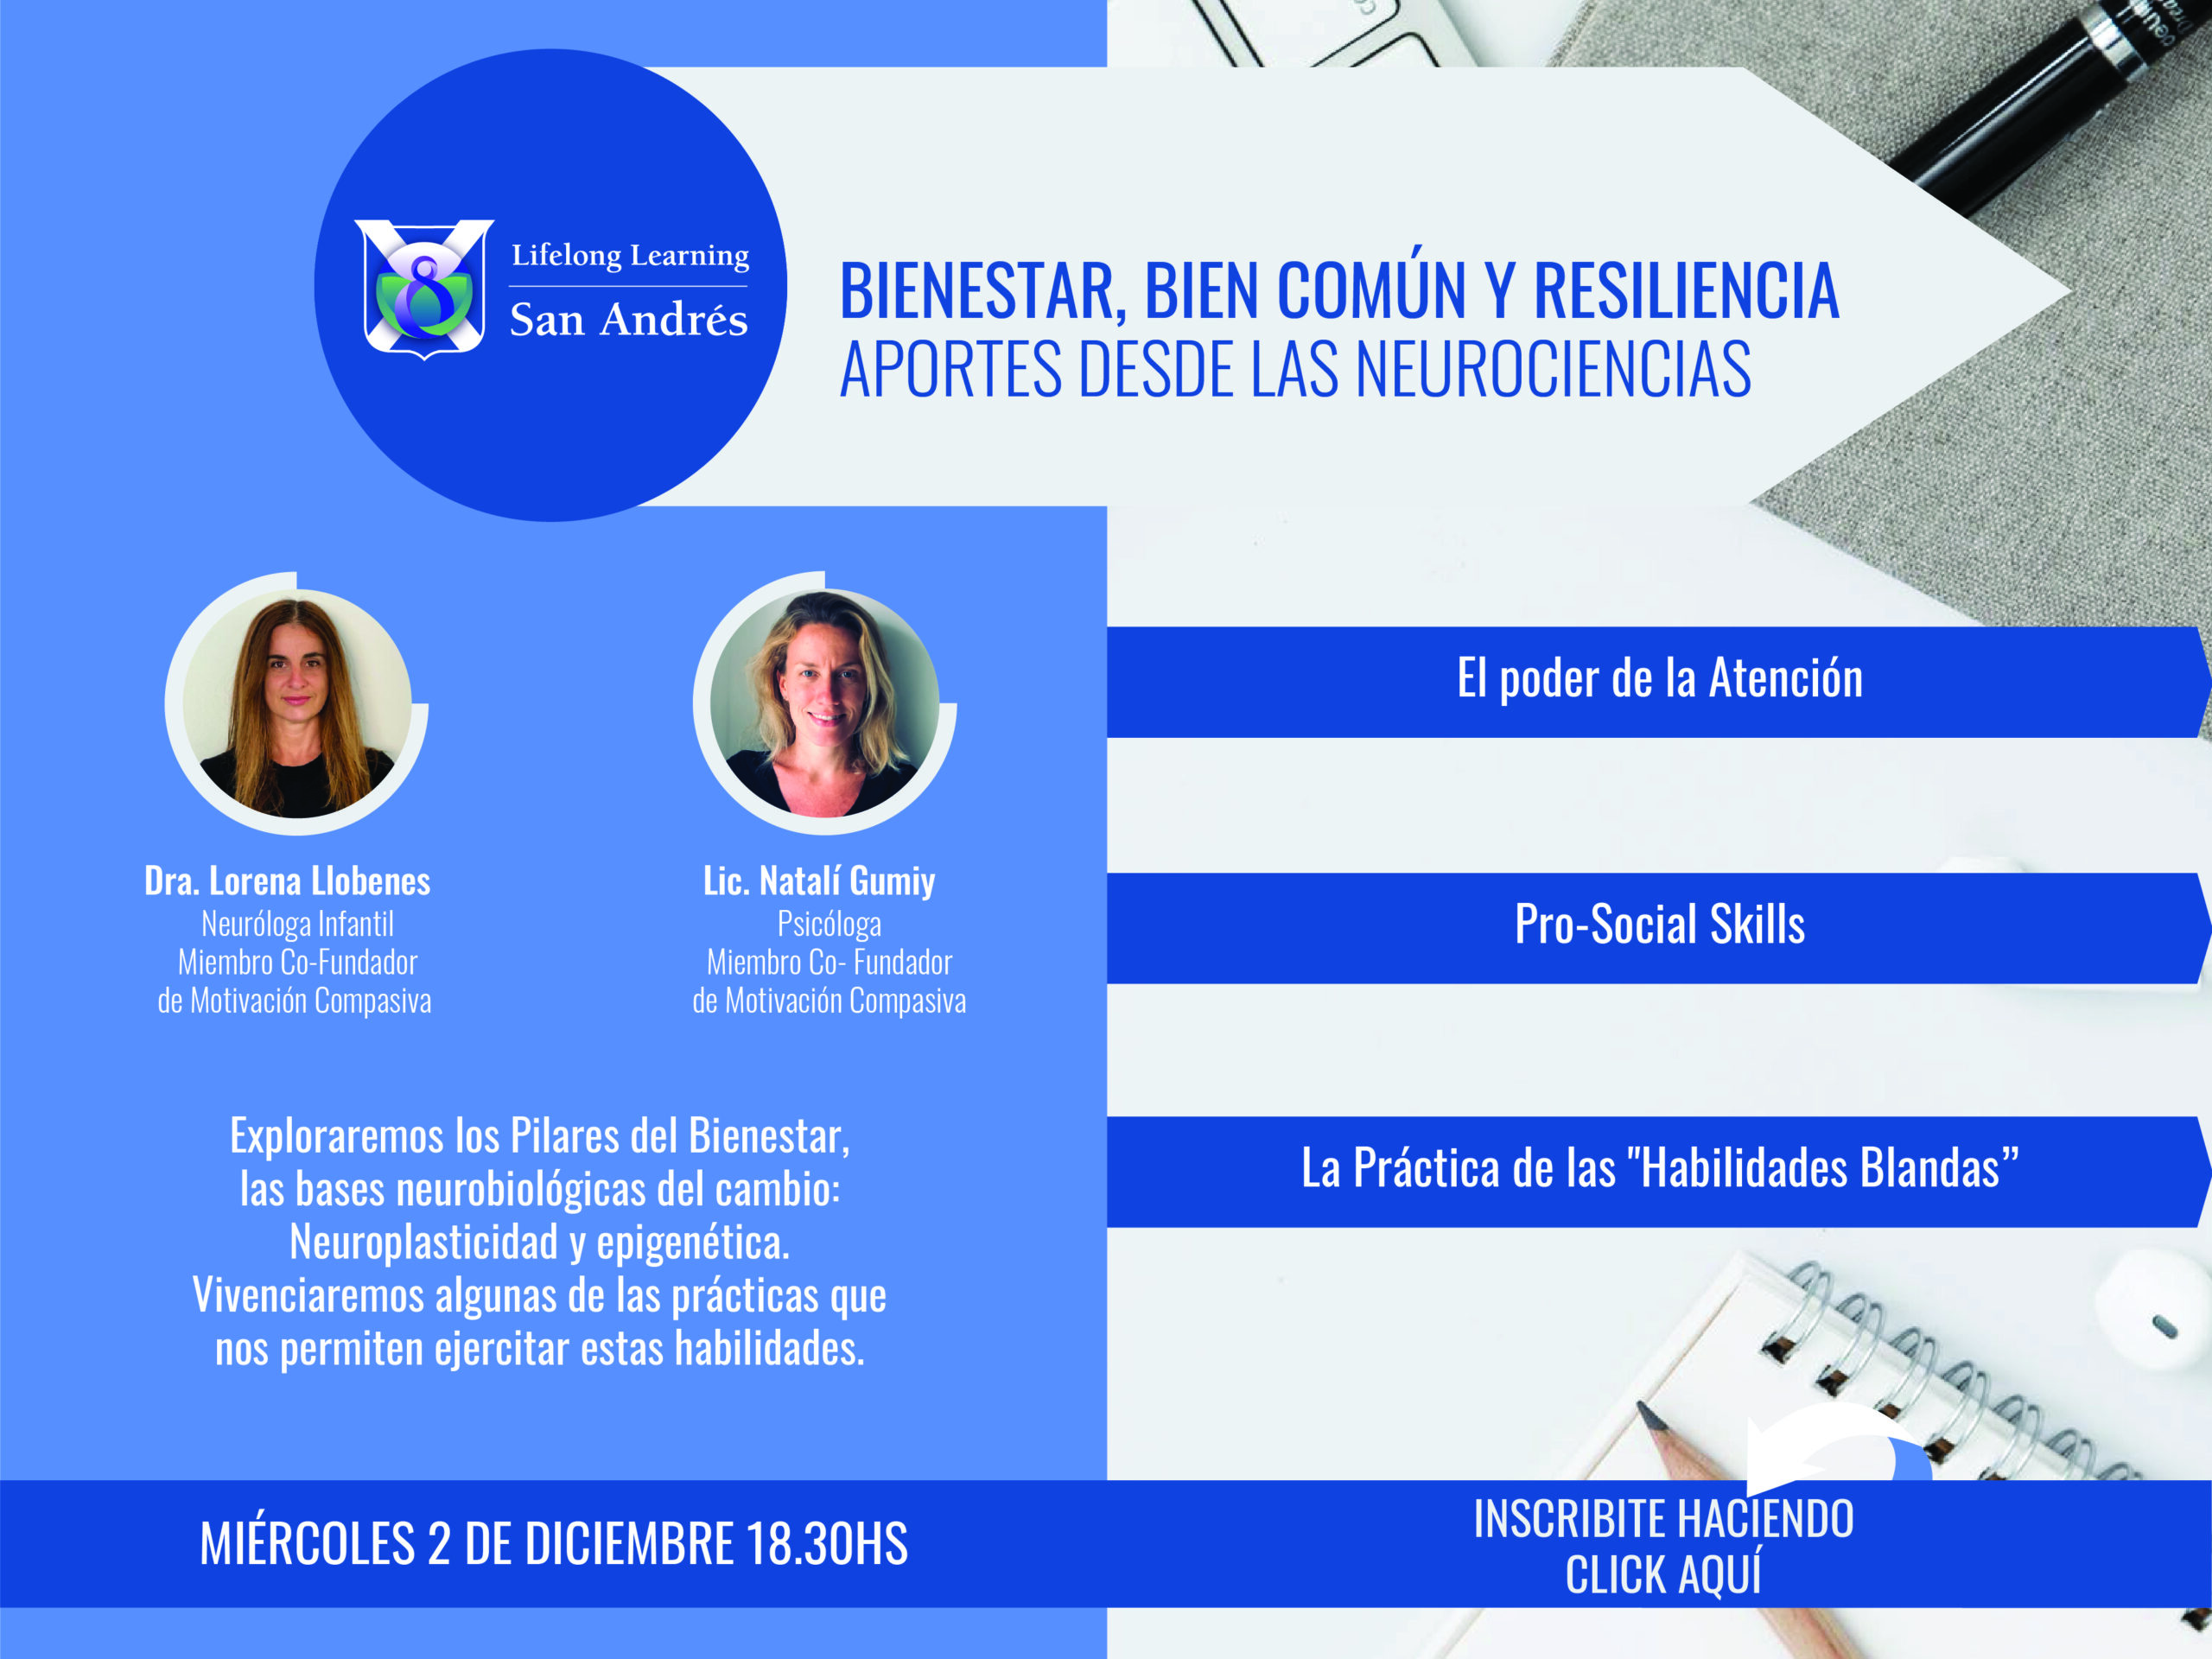 Lifelong Learning San Andrés Bienestar, bien común y resiliencia – Miércoles 2 de diciembre 18.30hs